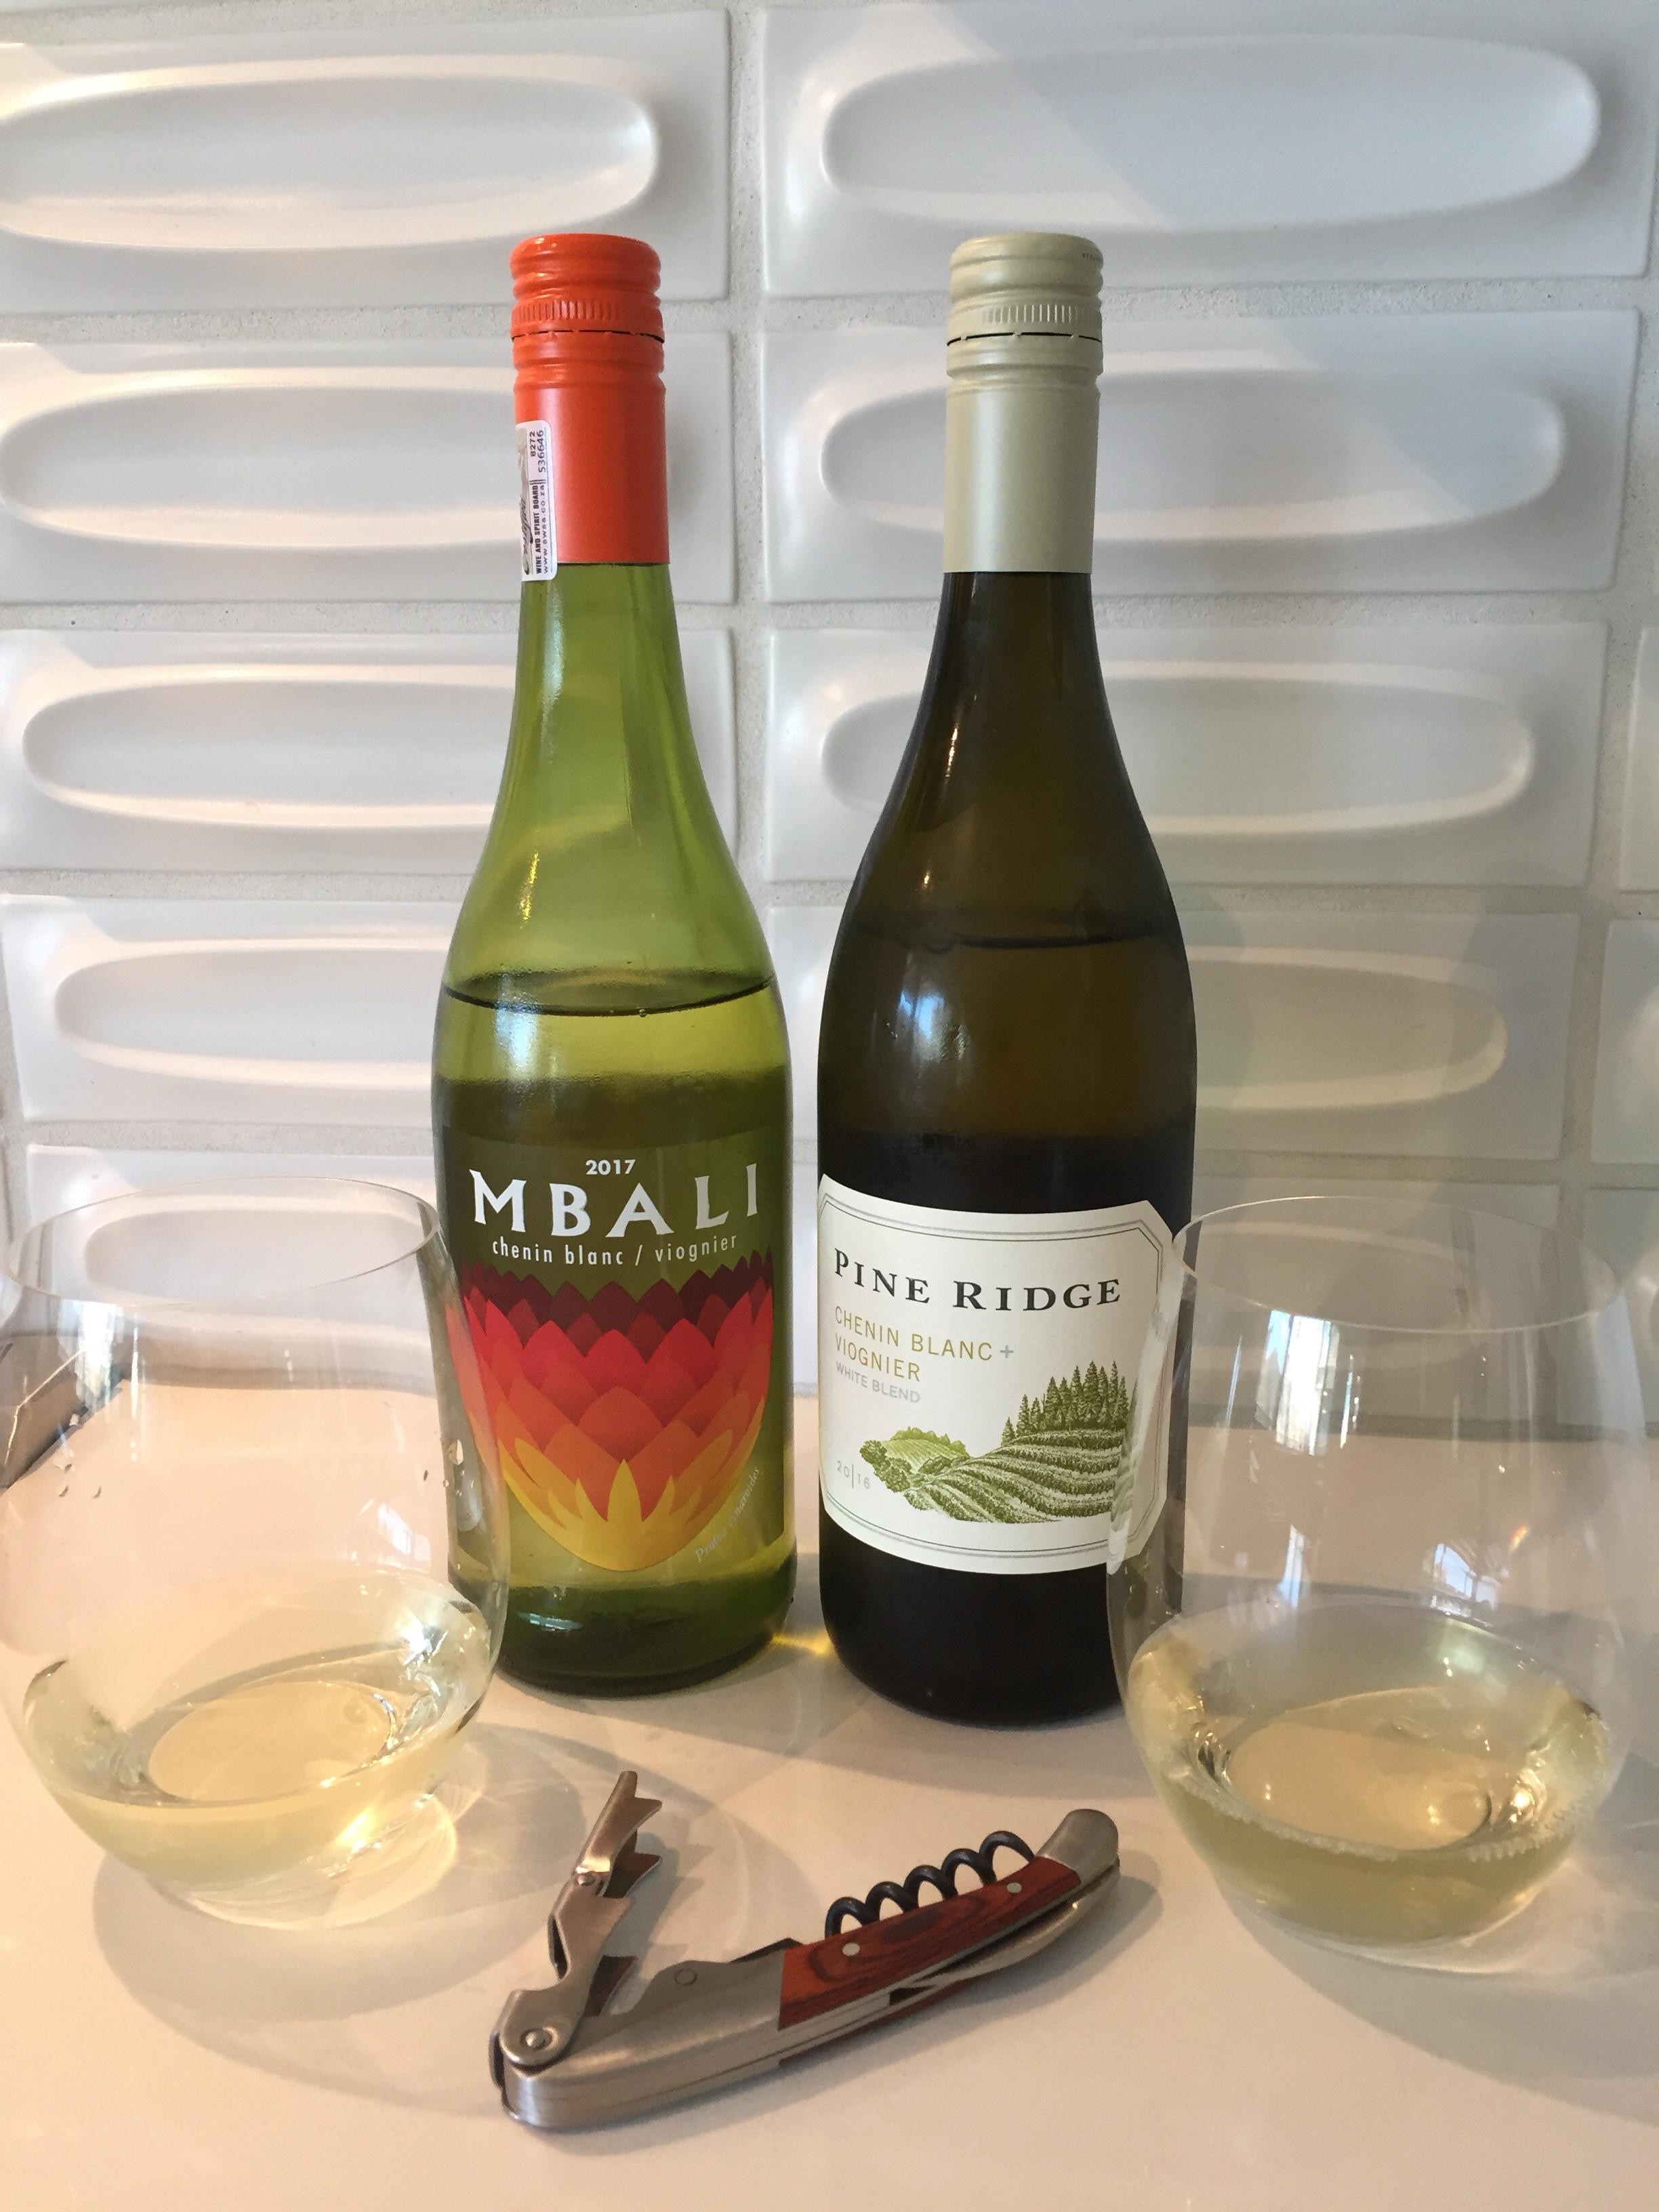 2017 Mbali Chenin Blanc/Viognier & 2016 Pine Ridge Chenin Blanc + Viognier